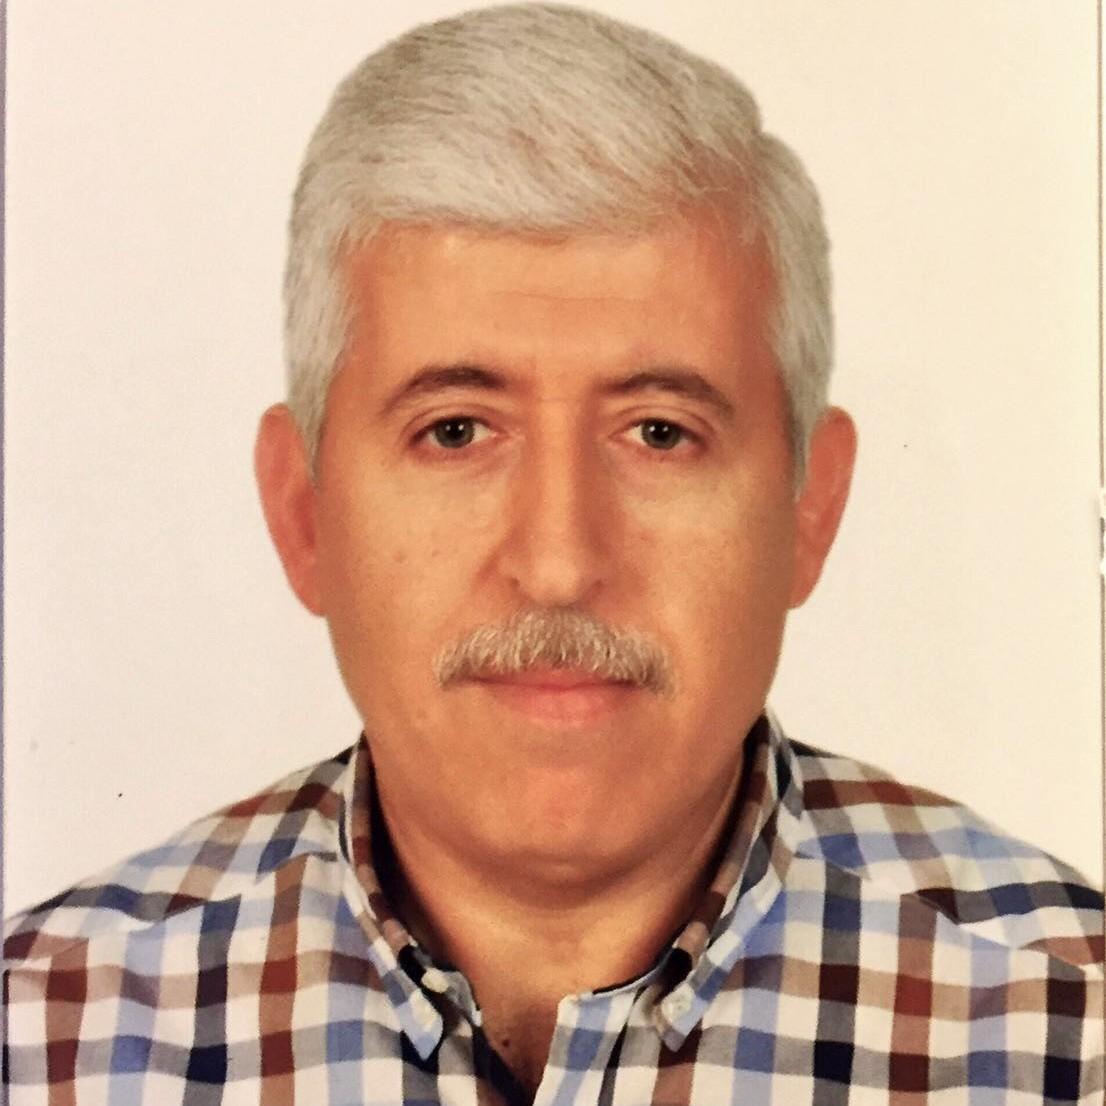 Mustafa DERİCİOĞLU